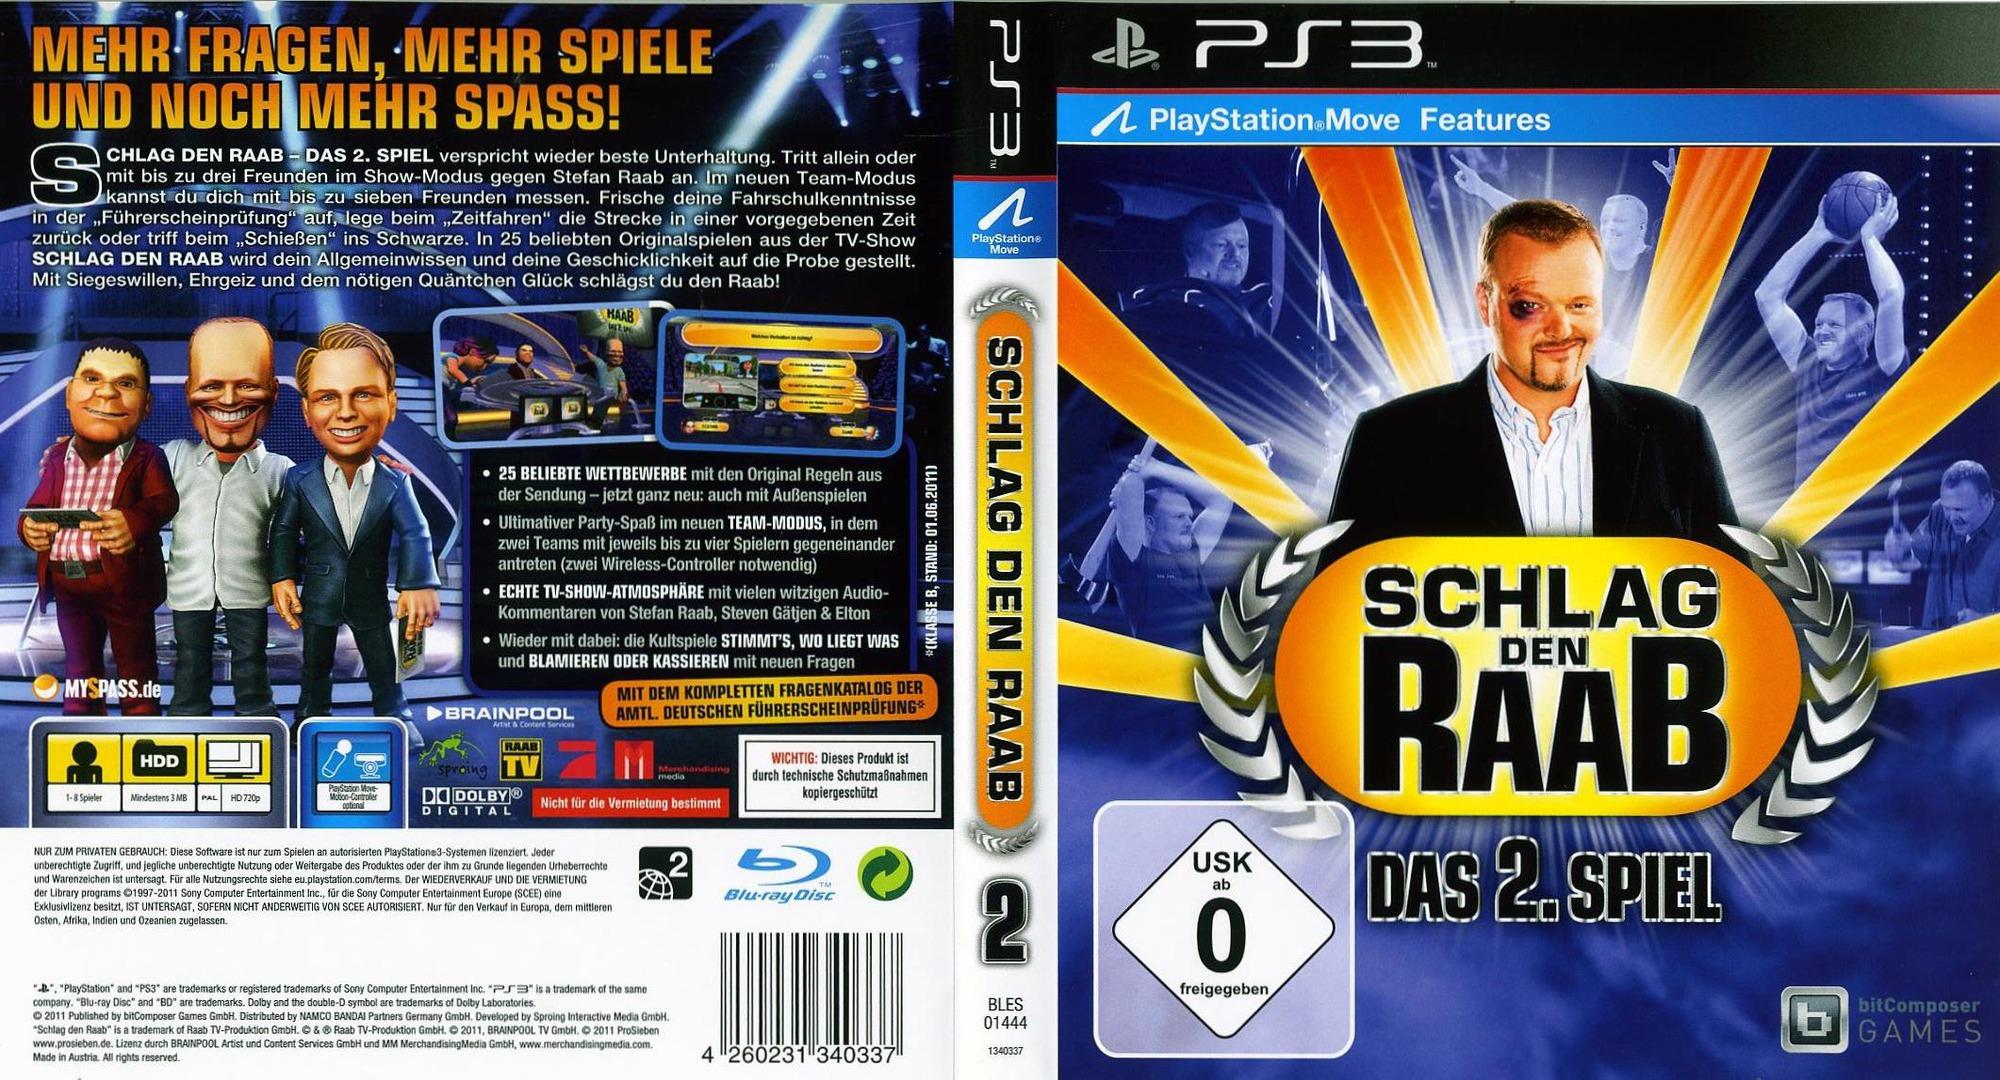 Schlag den Raab 2 PS3 coverfullHQ (BLES01444)